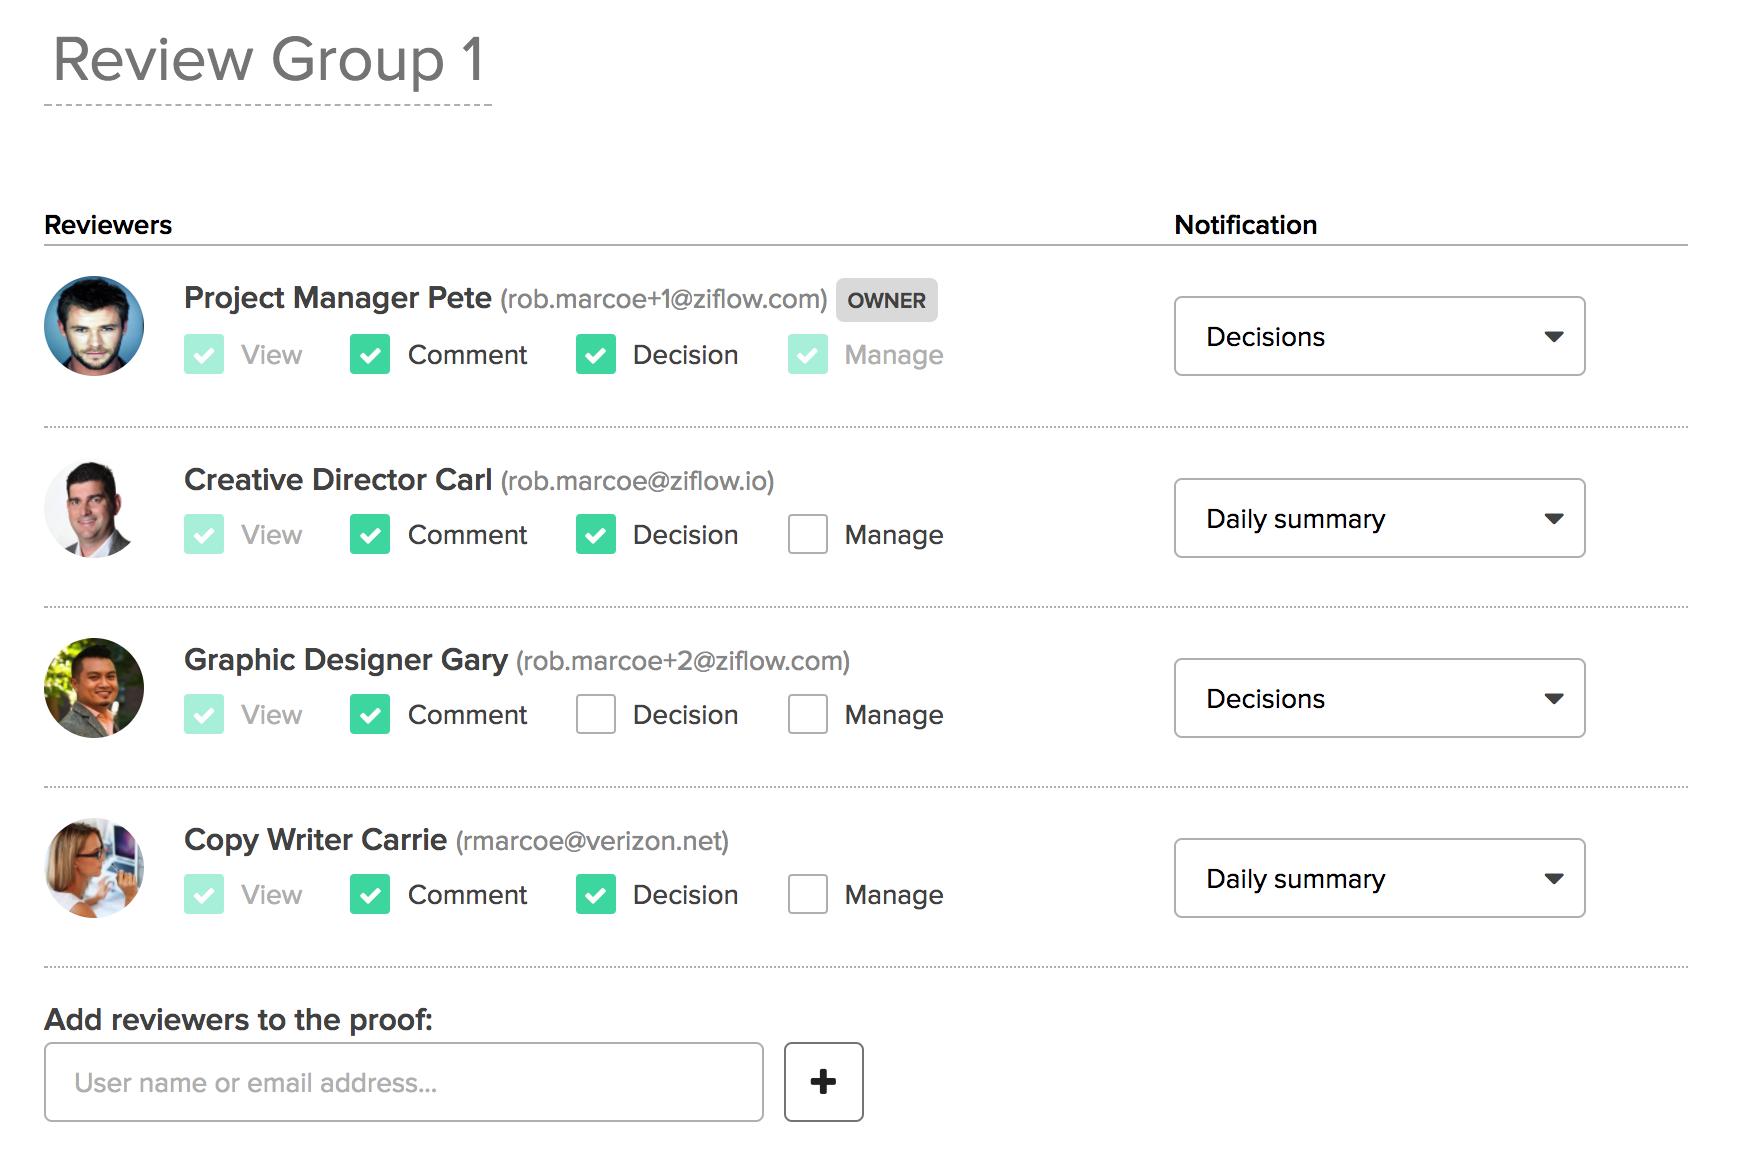 ziflow-review-groups